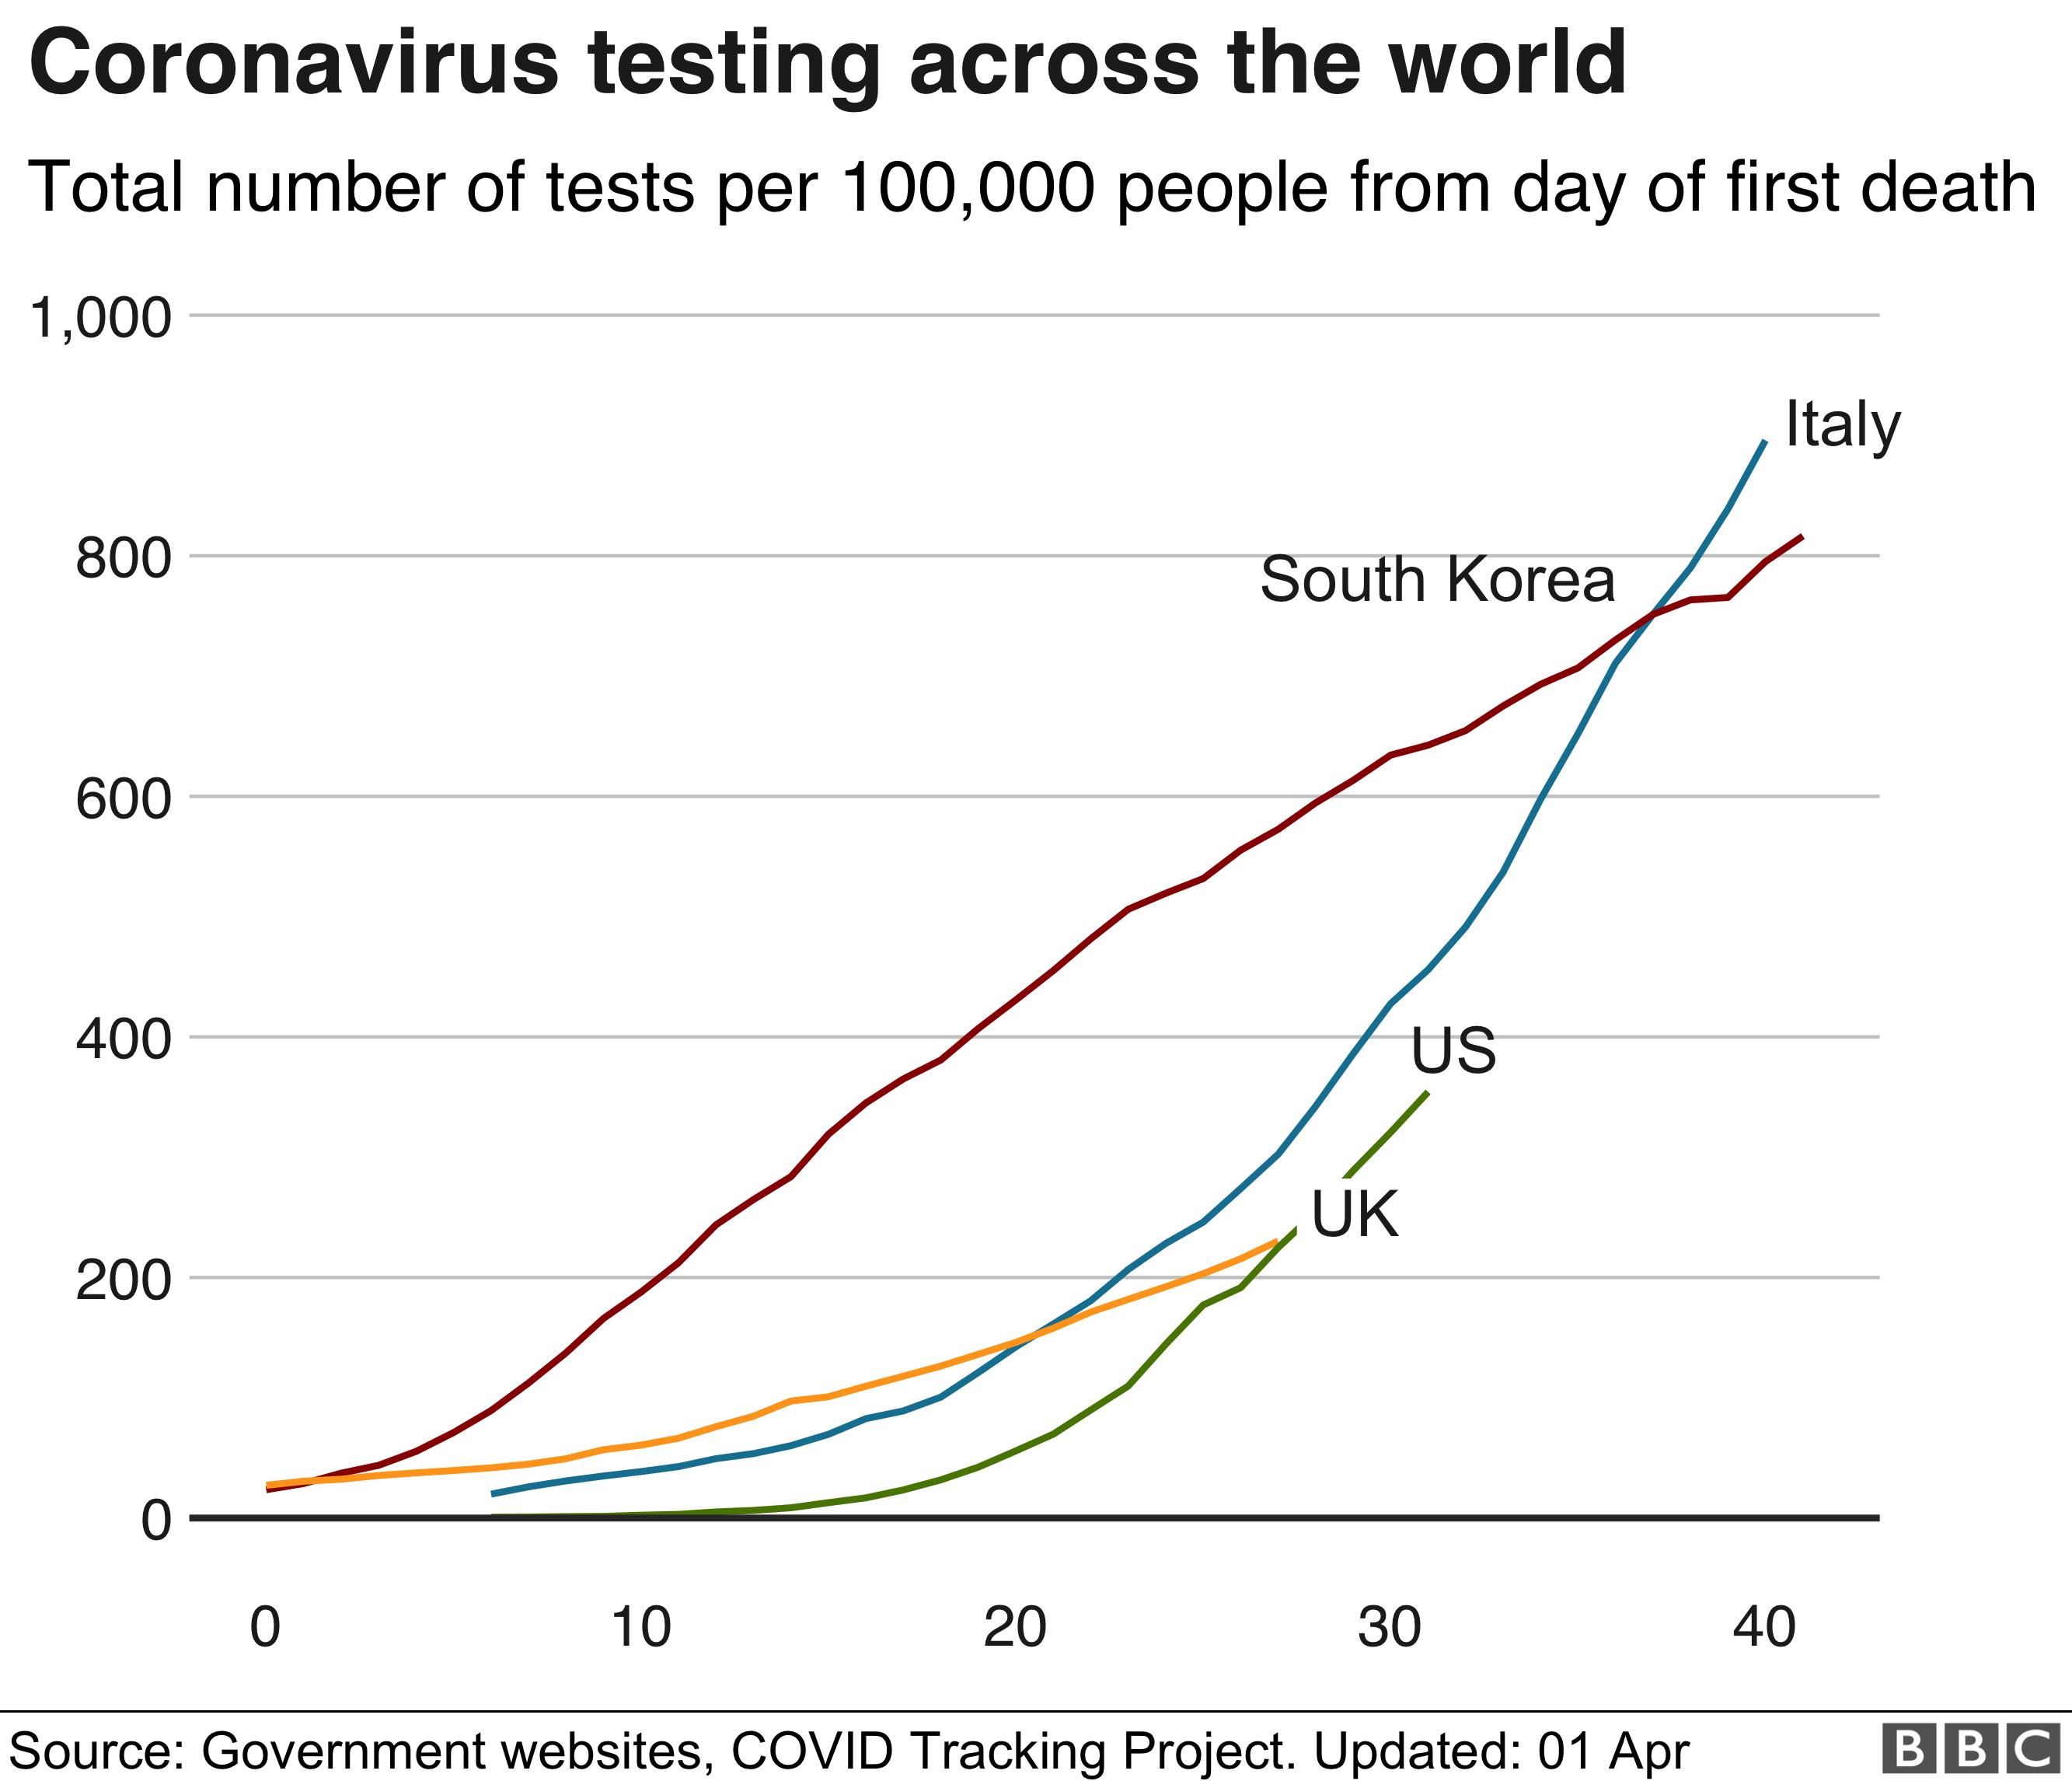 coronavirus testing across the world graph